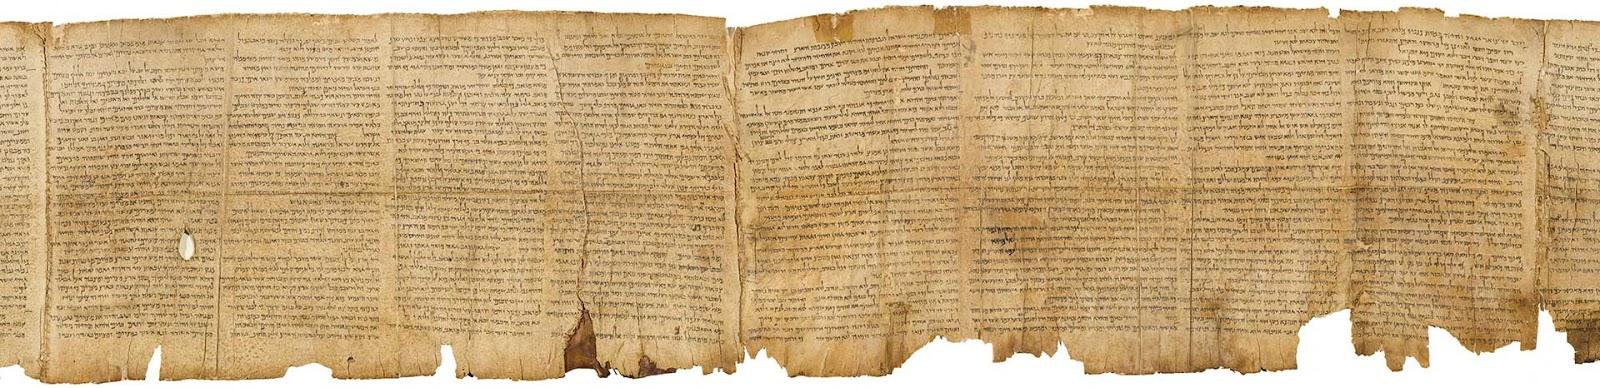 Manuscrito antigo das Sagradas Escrituras